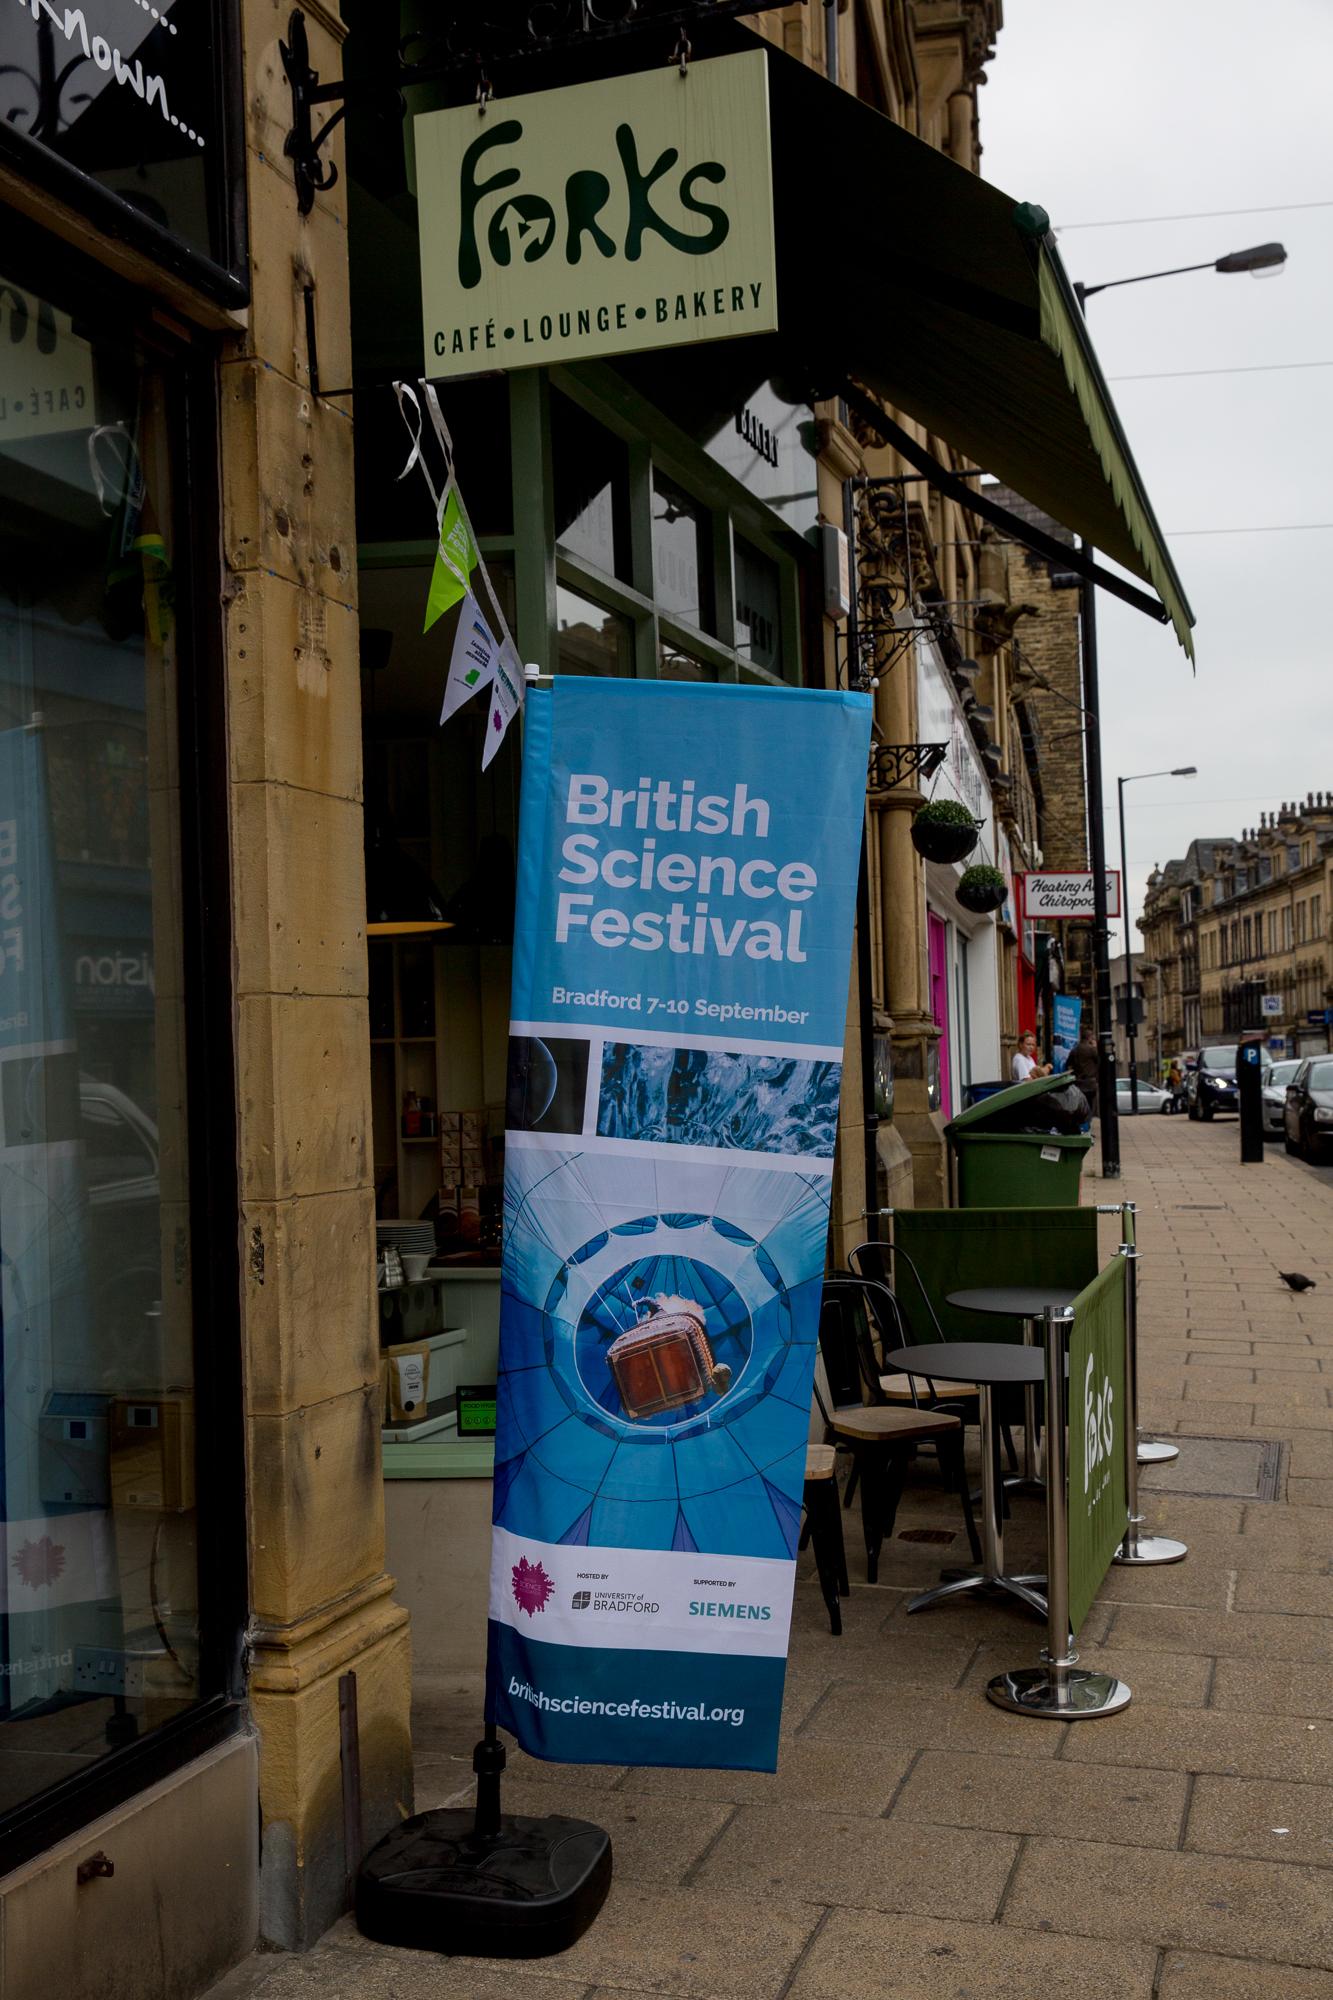 British Science Festival 2015